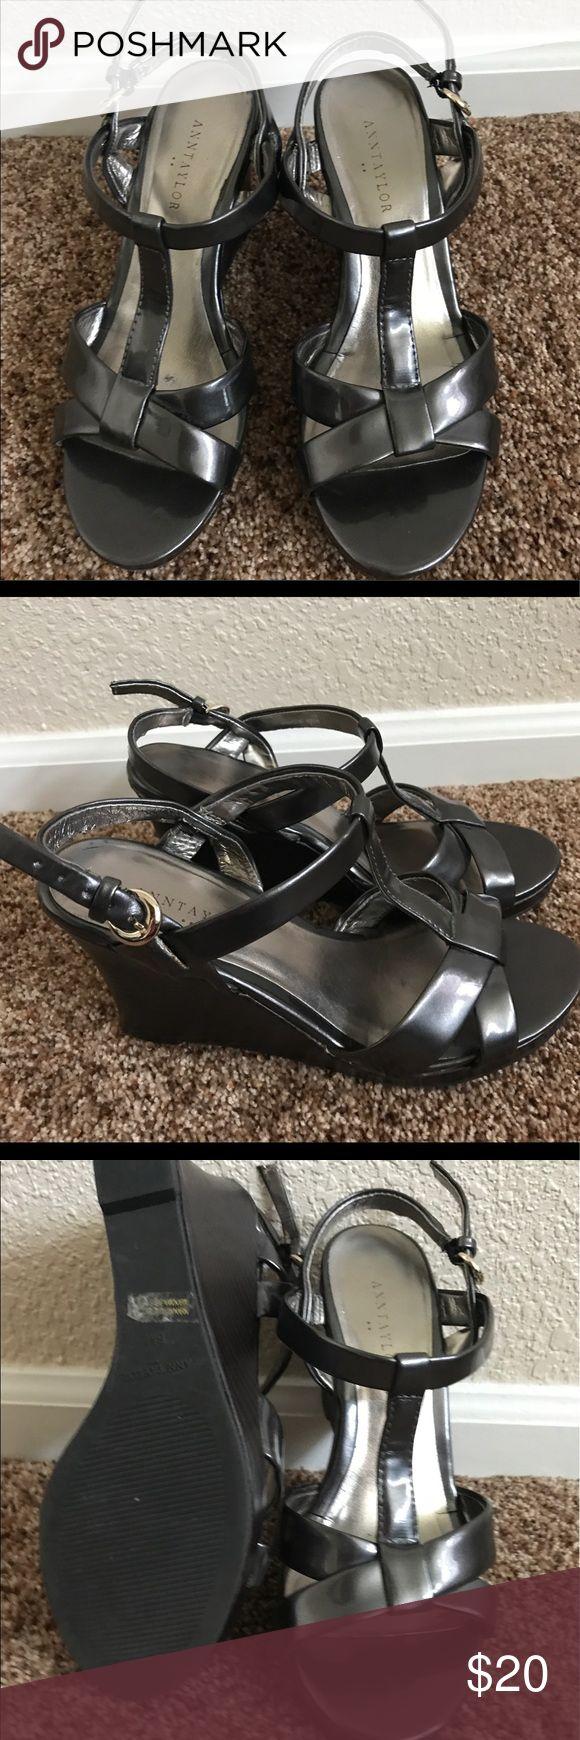 Ann Taylor grey/pewter sandals size 6 Comfy dark grey/silver Ann Taylor sandals, great condition.  Size 6 Ann Taylor Shoes Sandals